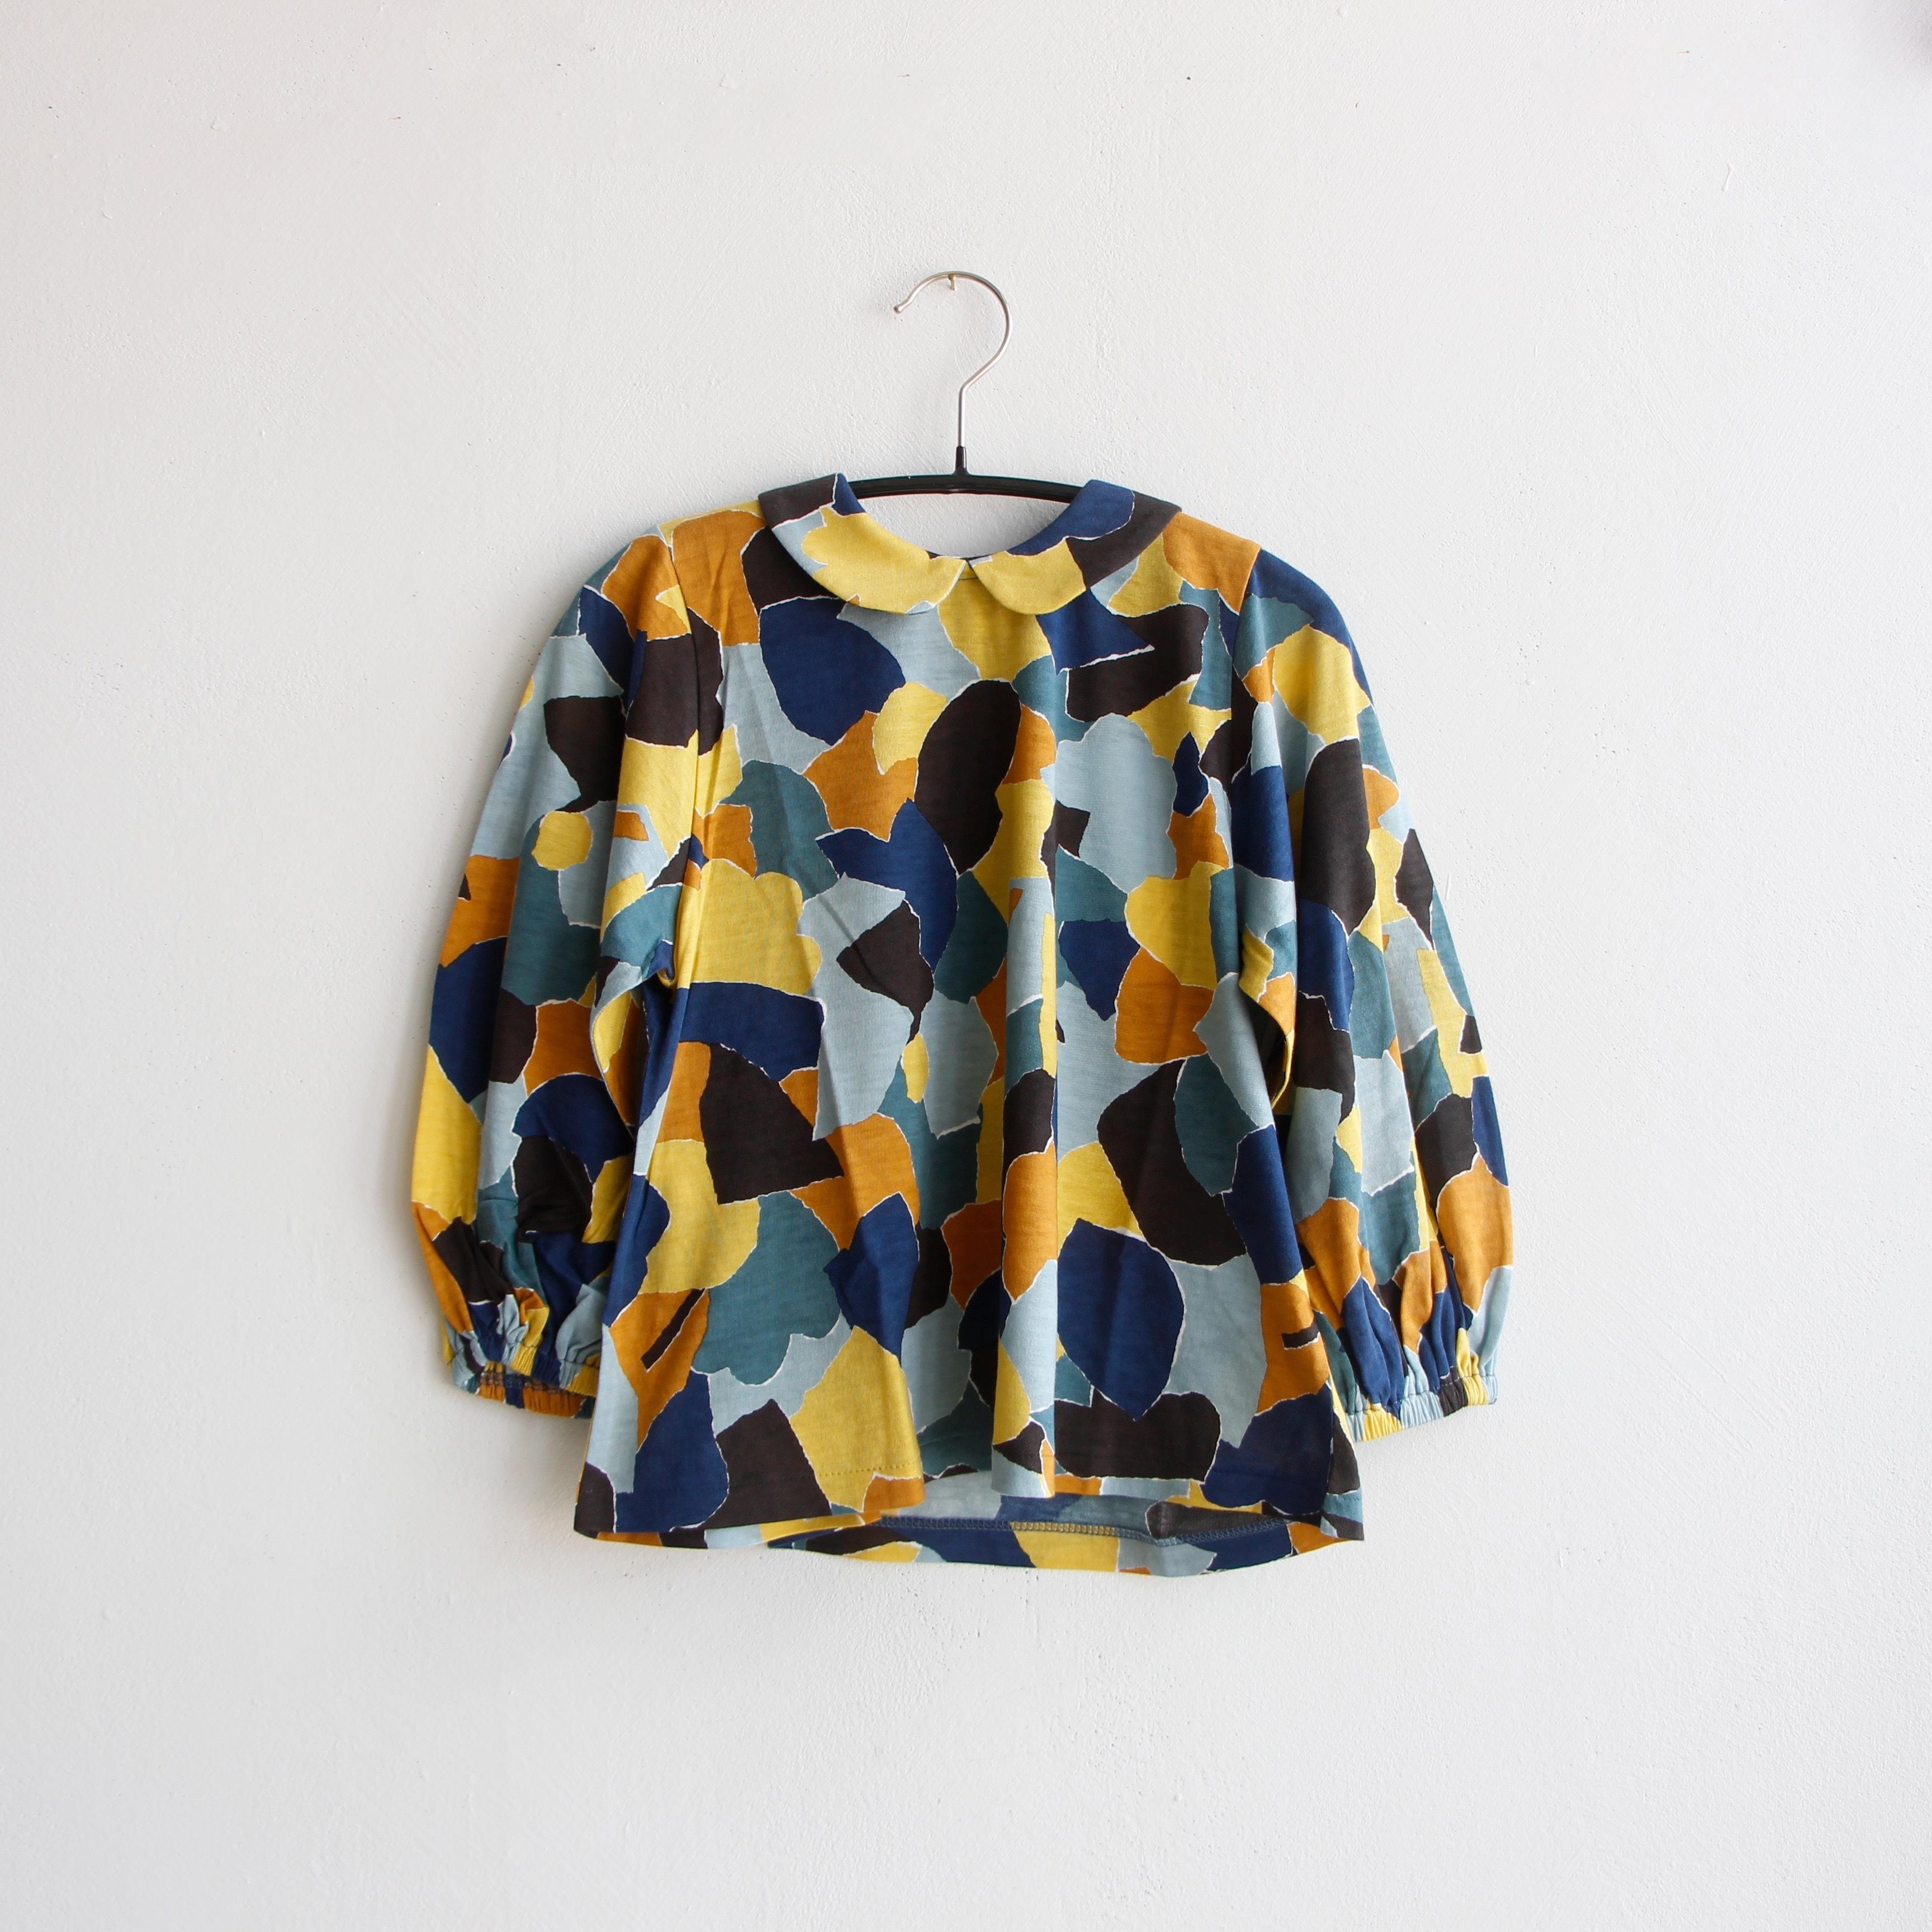 《mina perhonen 2020AW》foliage 長袖カットソー / yellow mix / 80-100cm